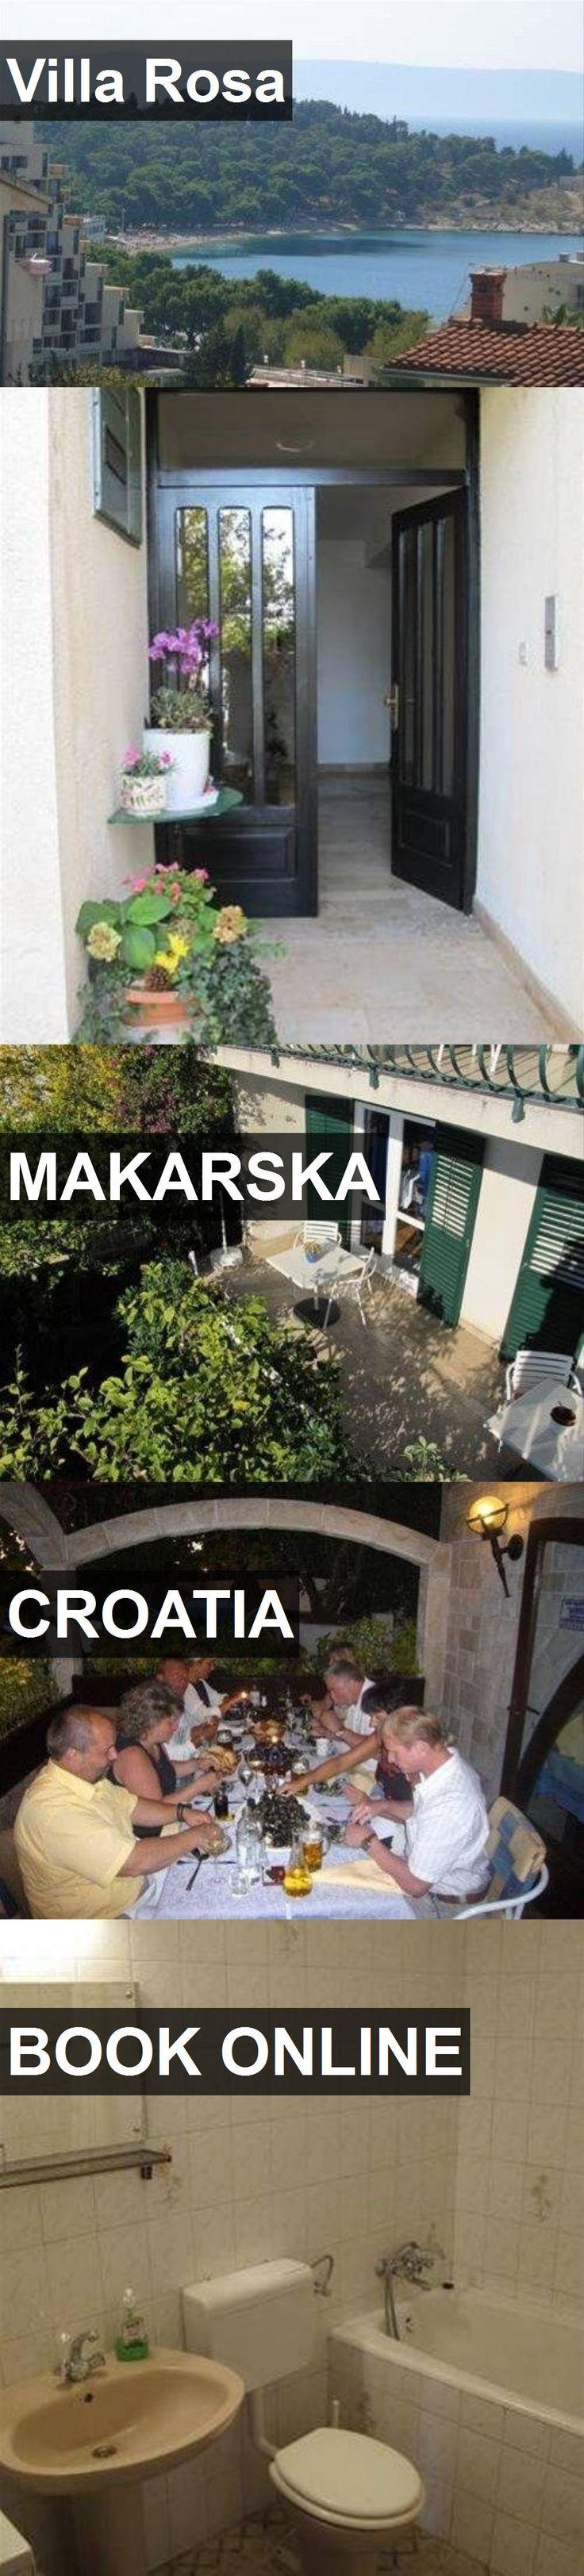 Hotel Villa Rosa in Makarska, Croatia. For more information, photos, reviews and best prices please follow the link. #Croatia #Makarska #travel #vacation #hotel